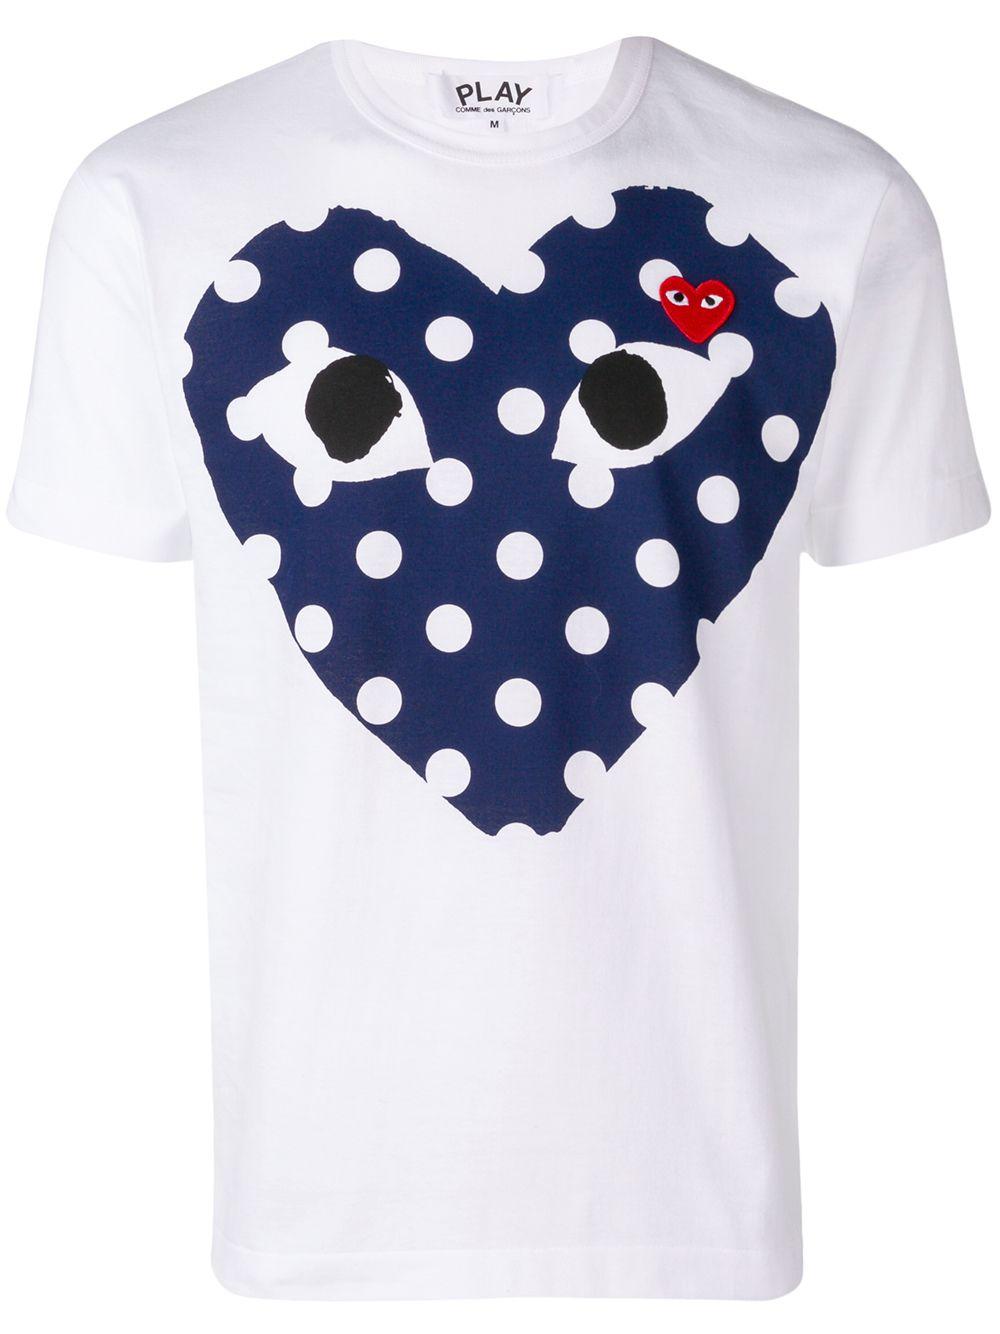 Comme Des Garçons Play t-shirt uomo bianco COMME DES GARÇONS PLAY | T-shirt | P1T234A